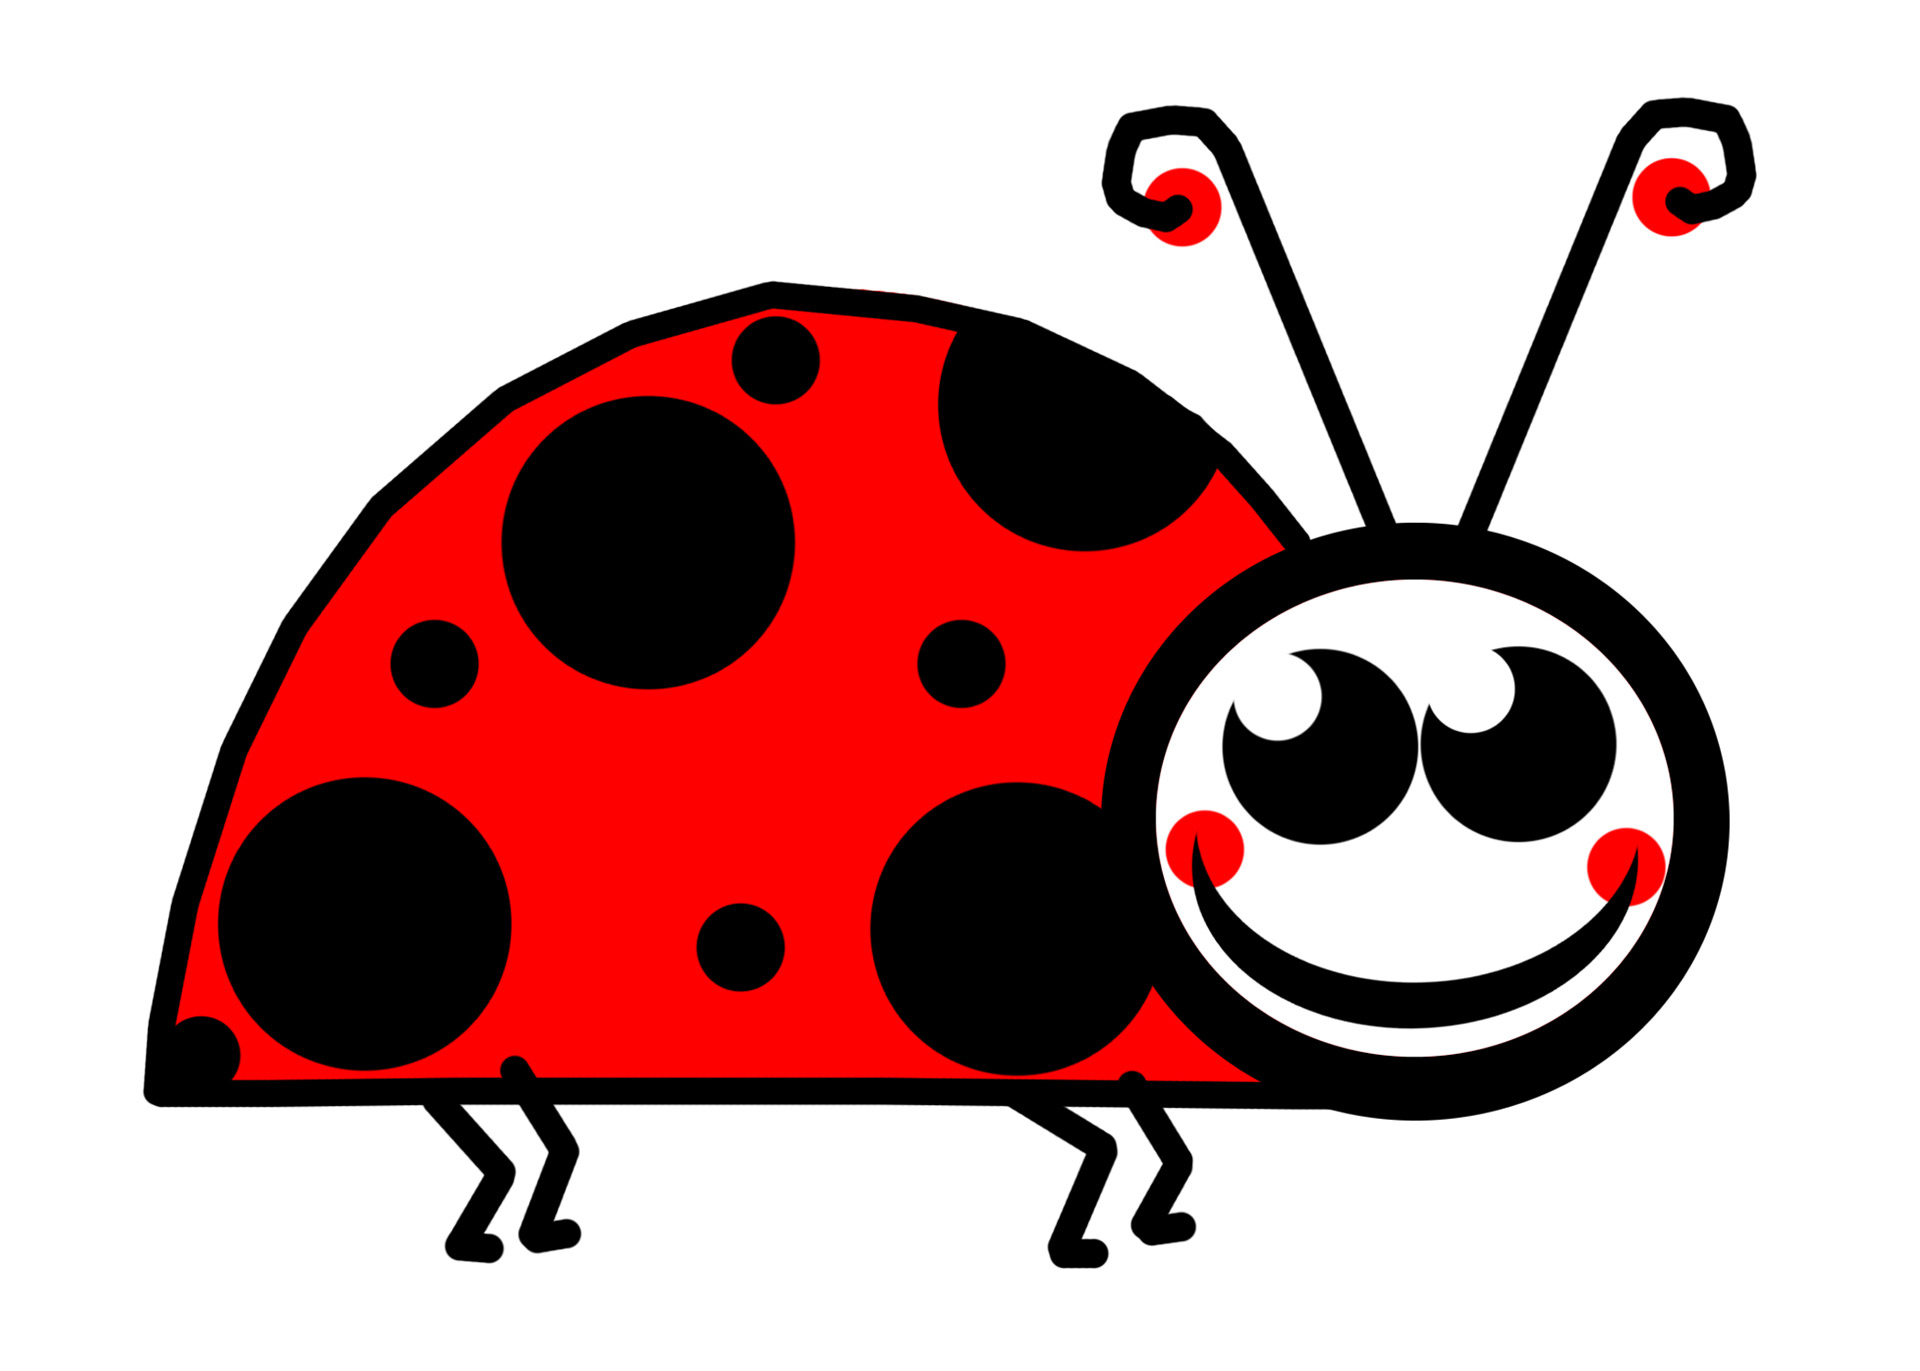 Ladybug lady bug clip art free pictures